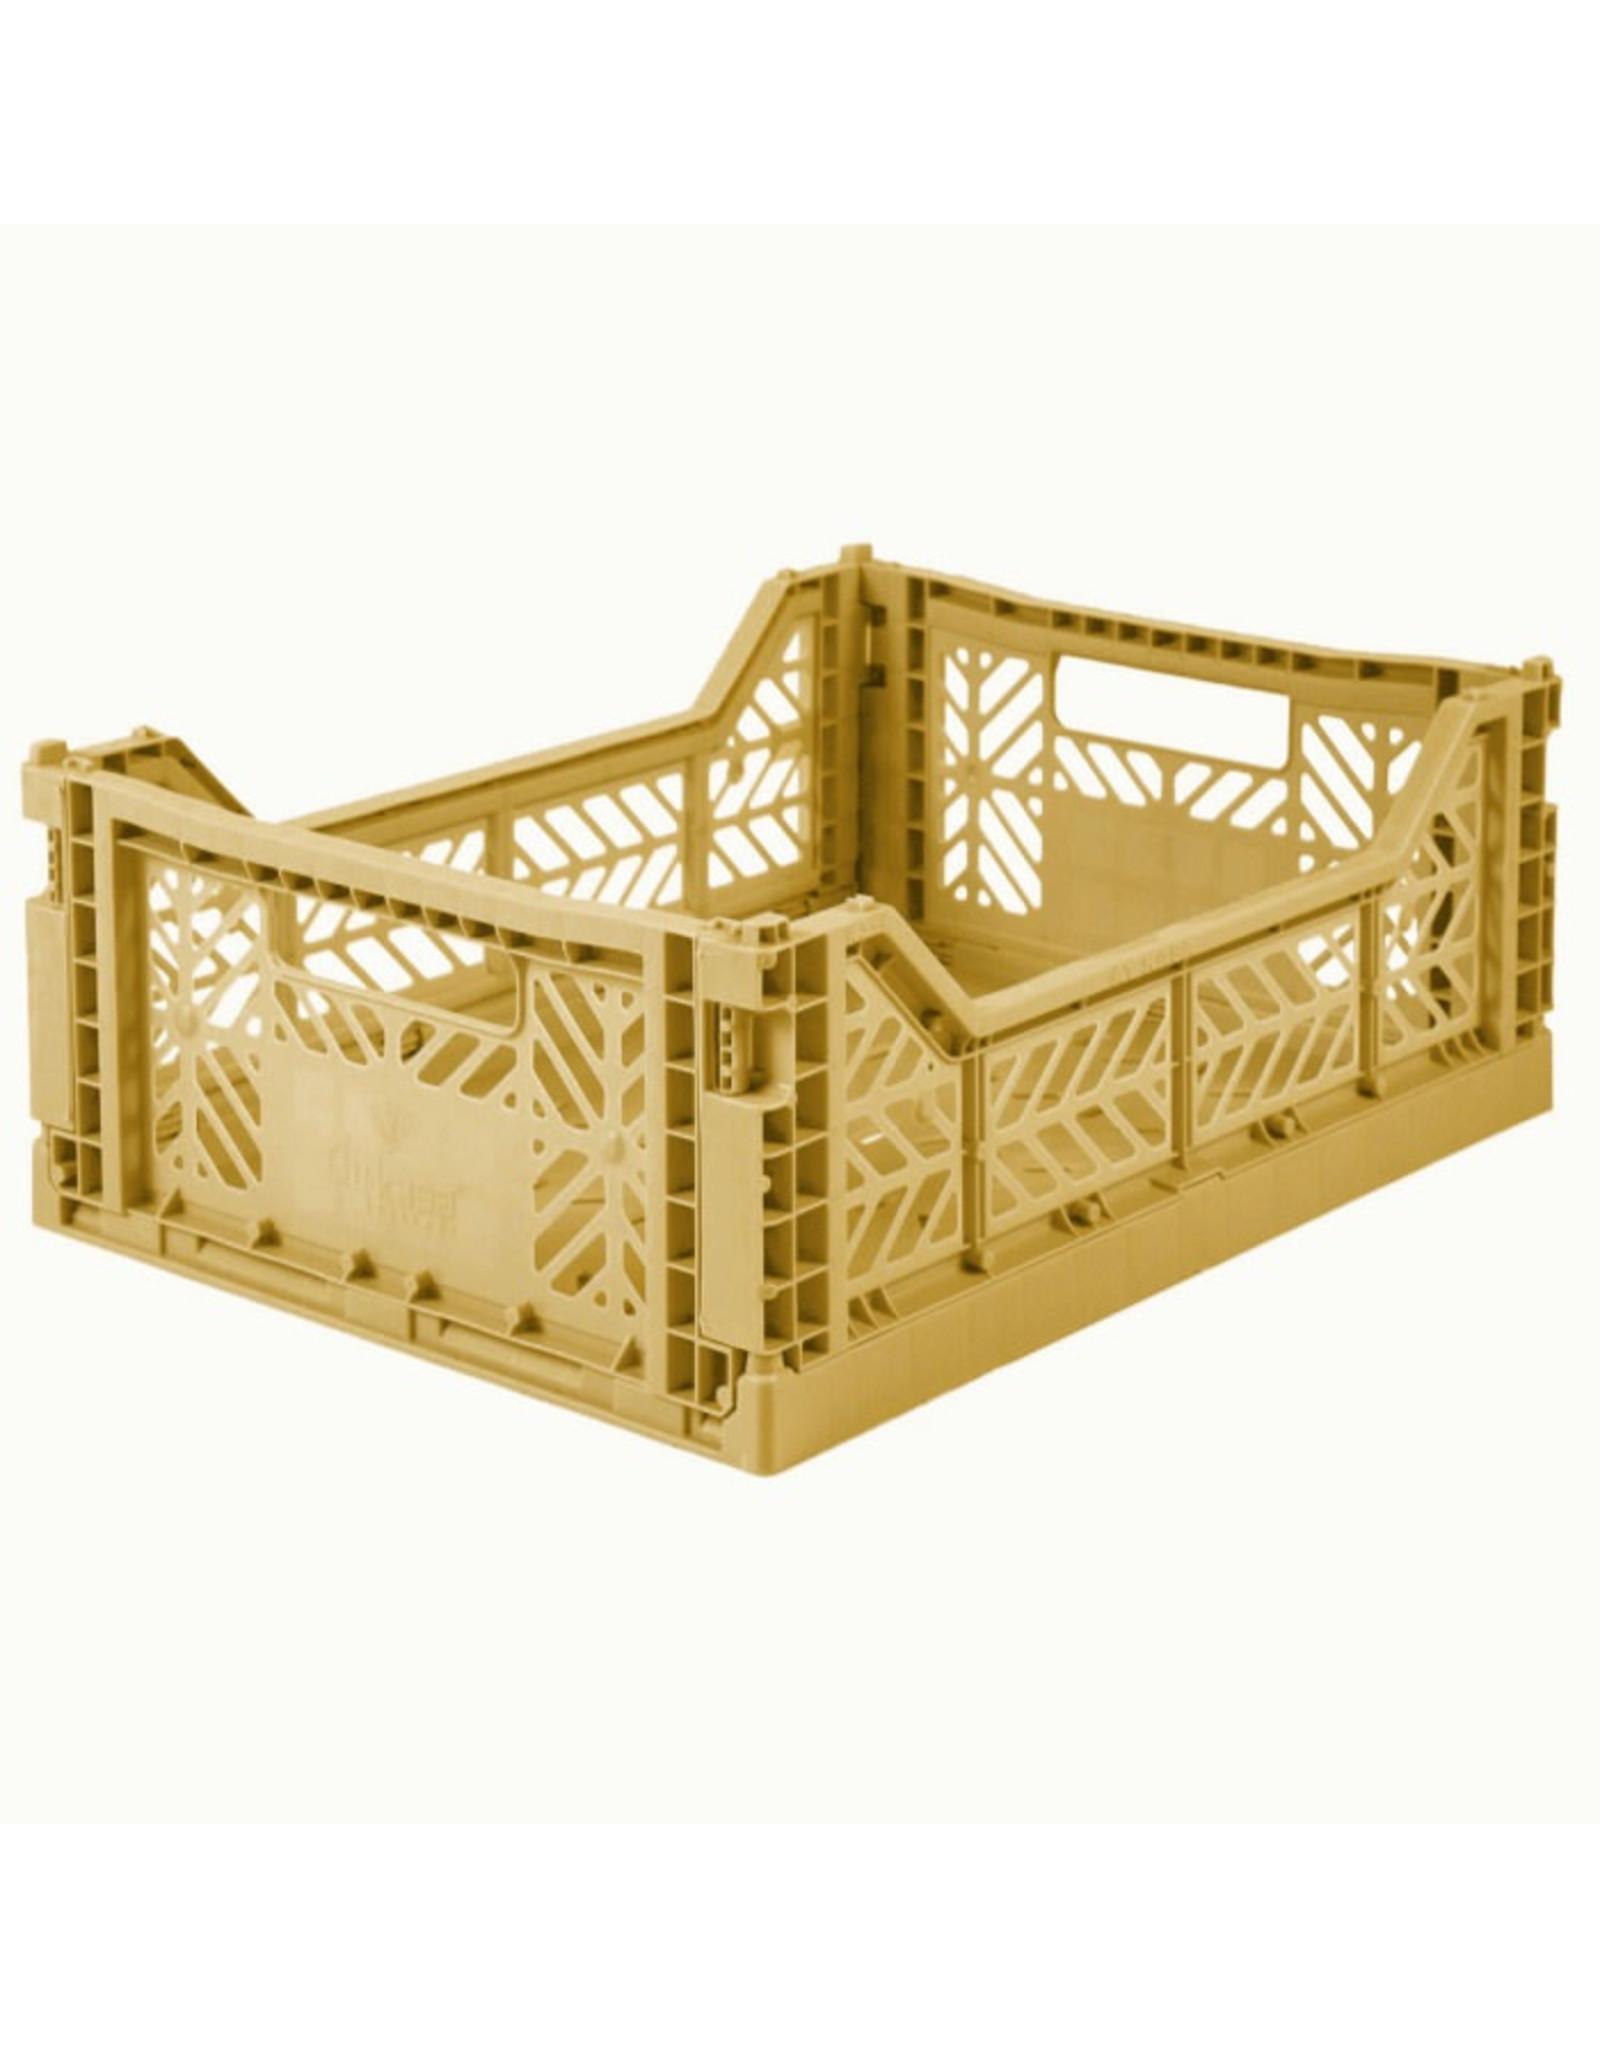 Ay-Kasa Aykasa Box - Midi - Gold